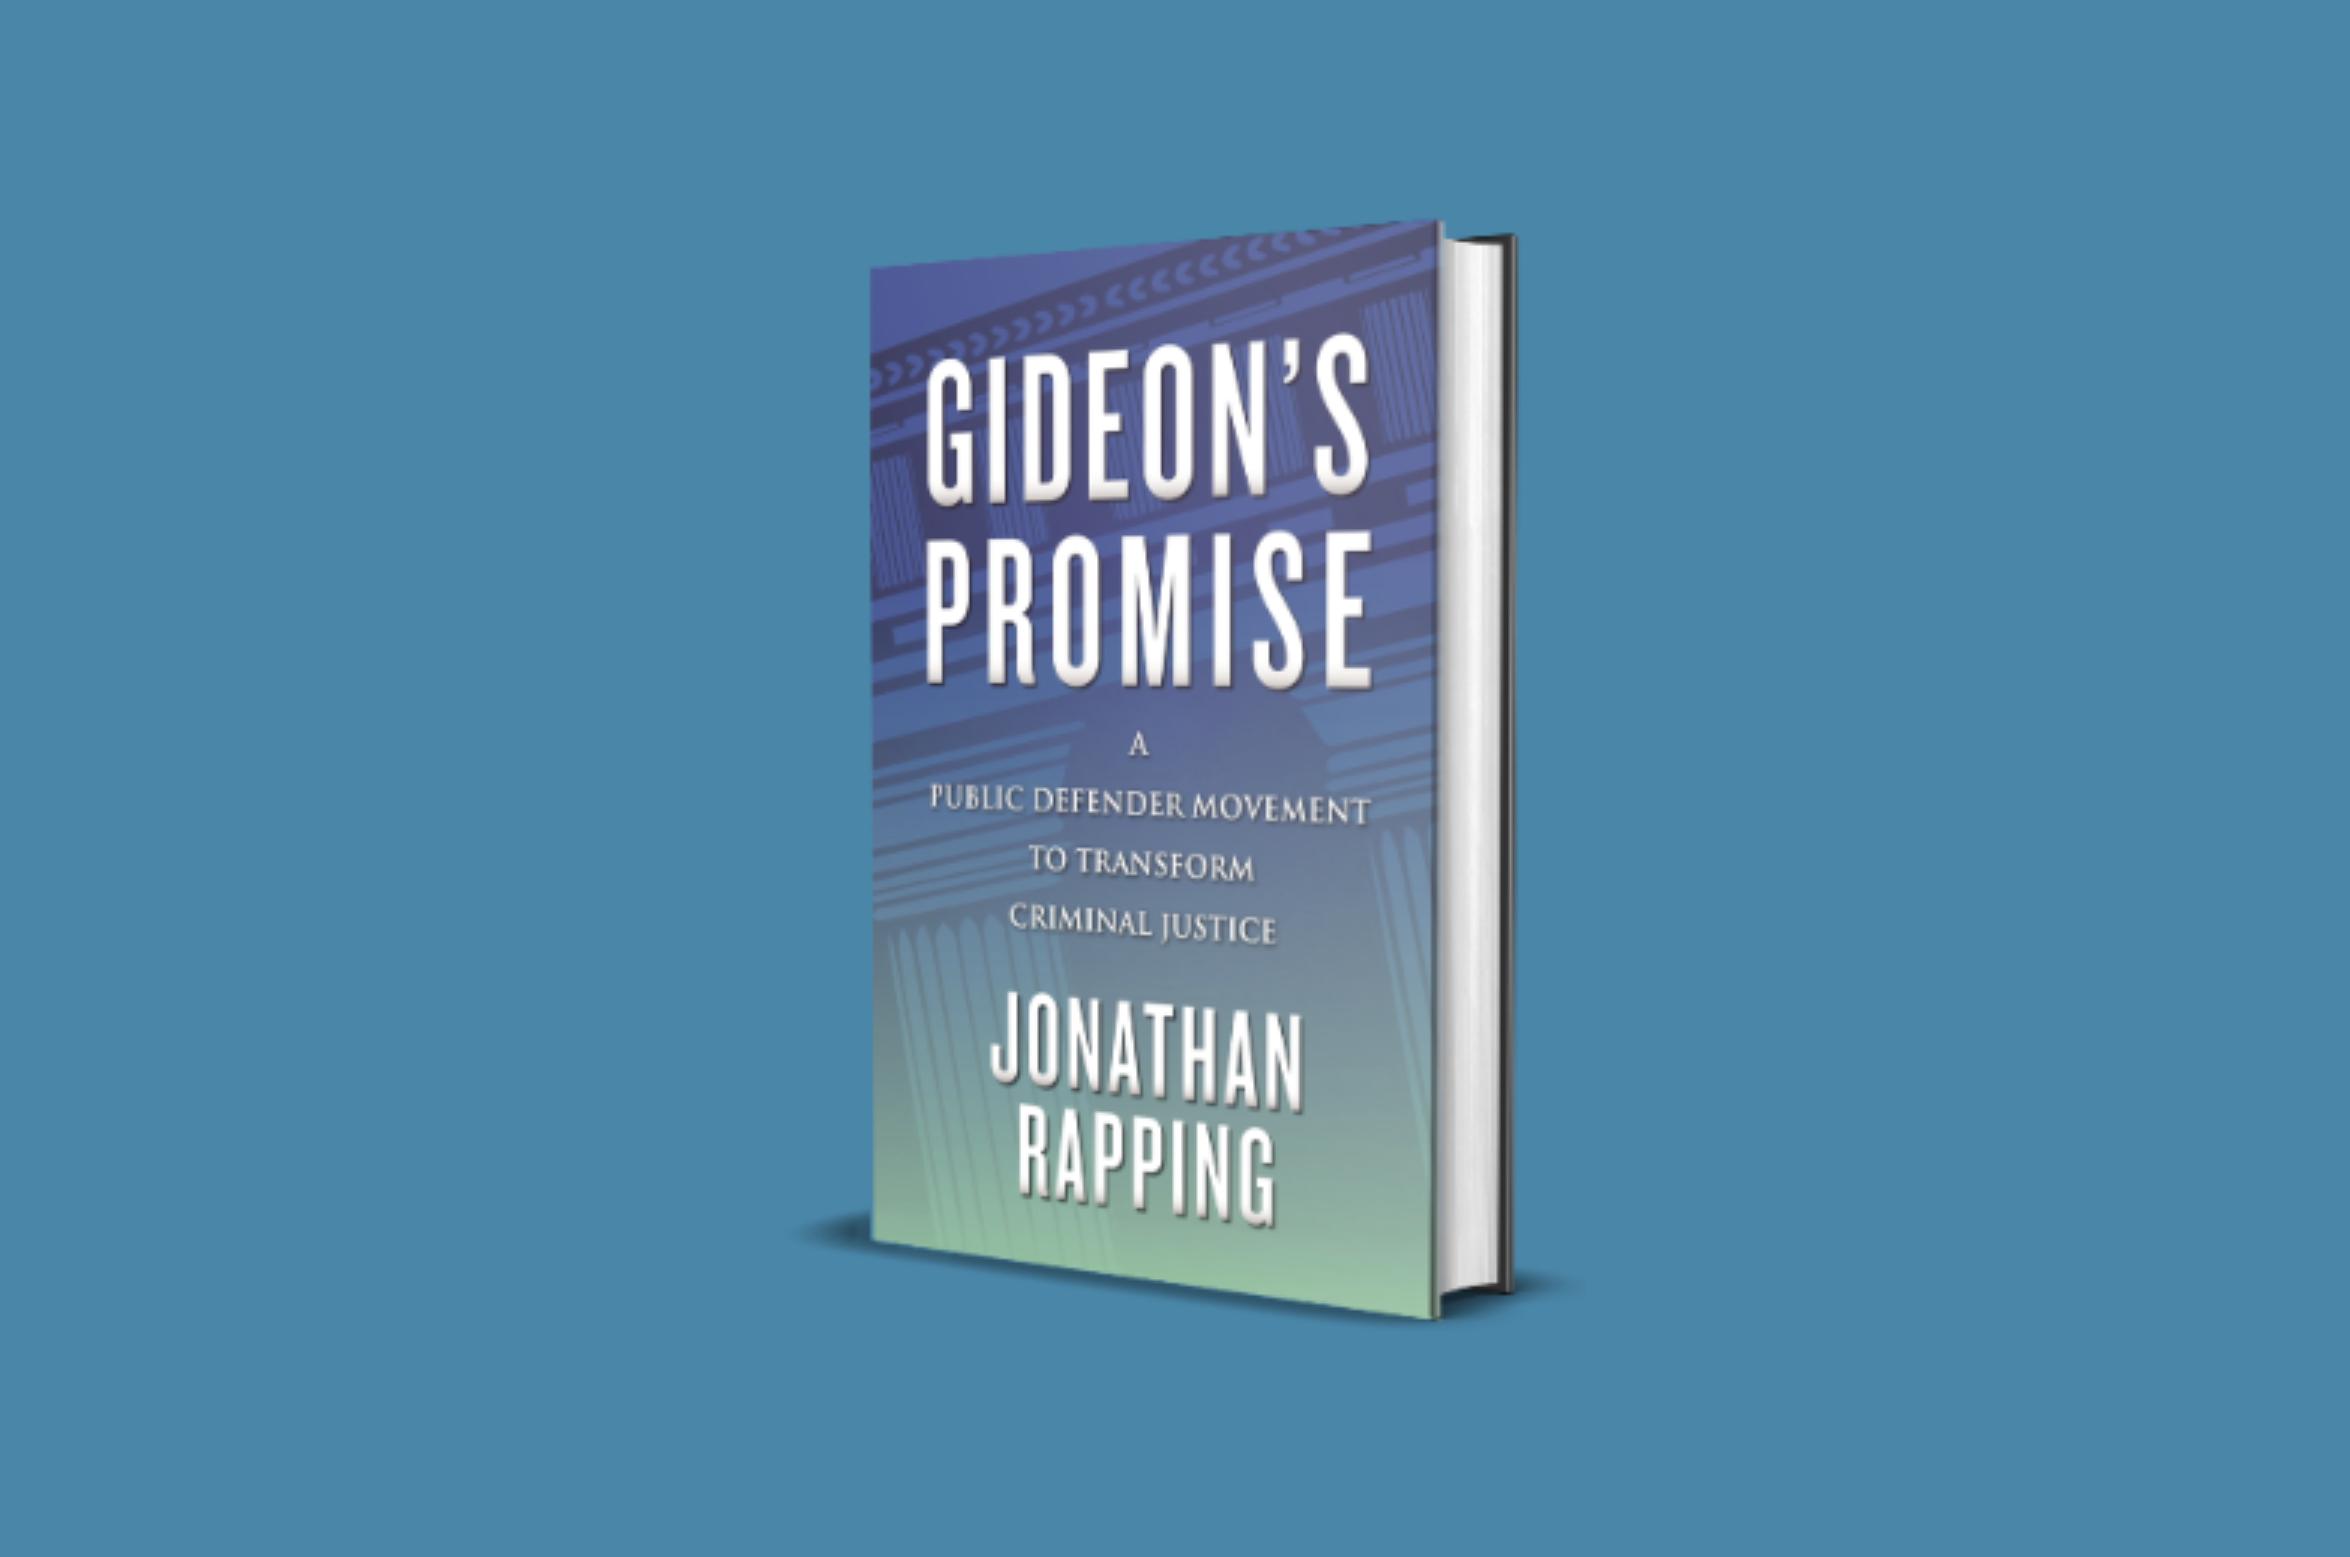 Gideon's Promise: Transforming Criminal Justice